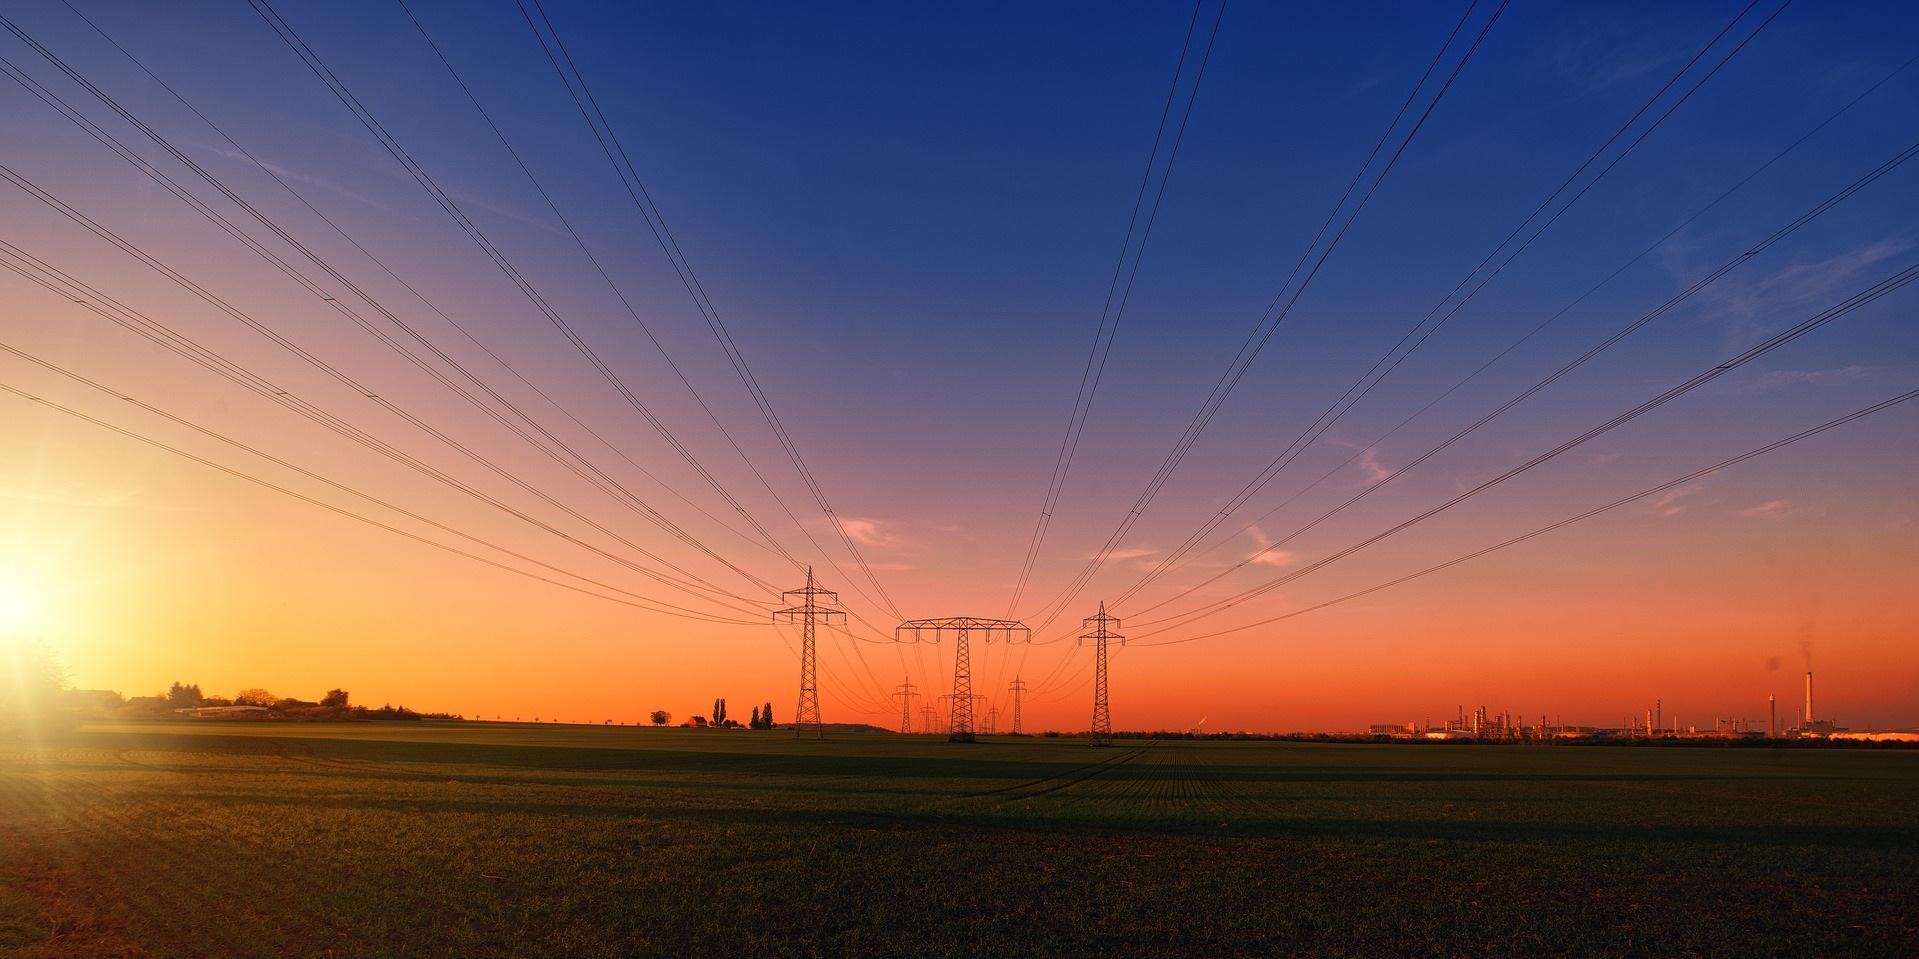 electricity-3442835_1920.jpg